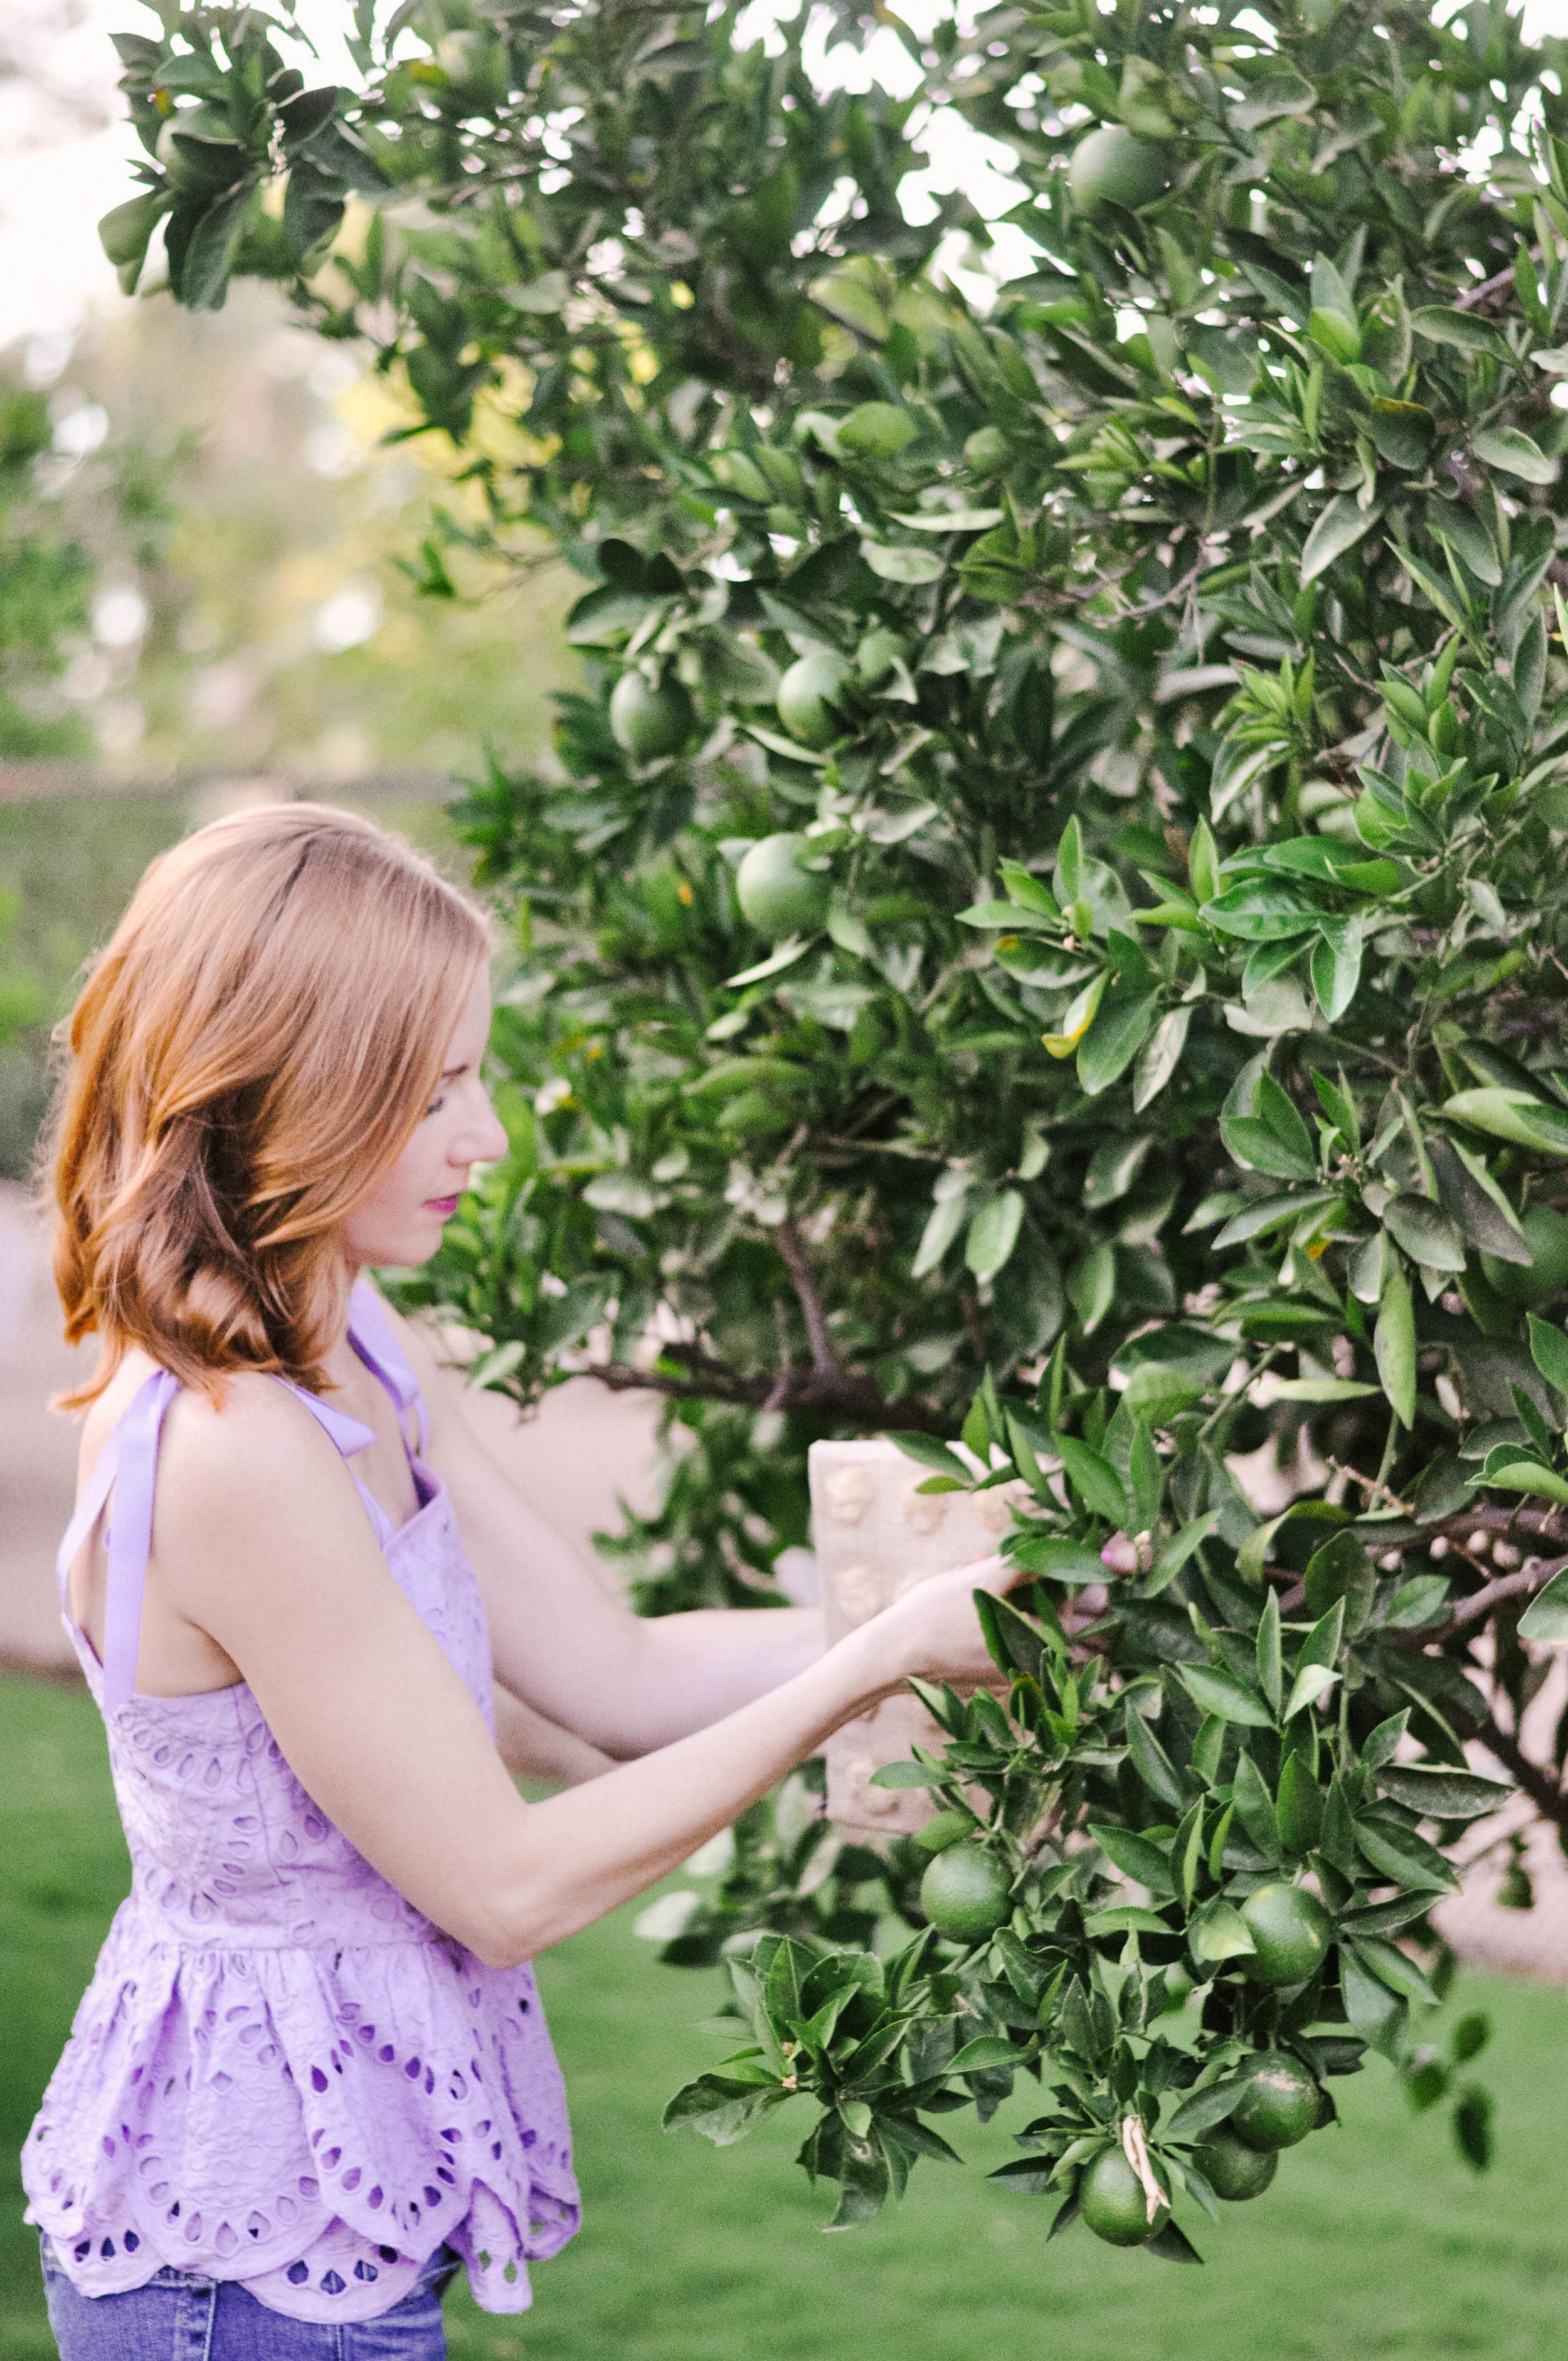 woman with red hair looking at citrus tree in J.Crew lavender eyelet tie shoulder top